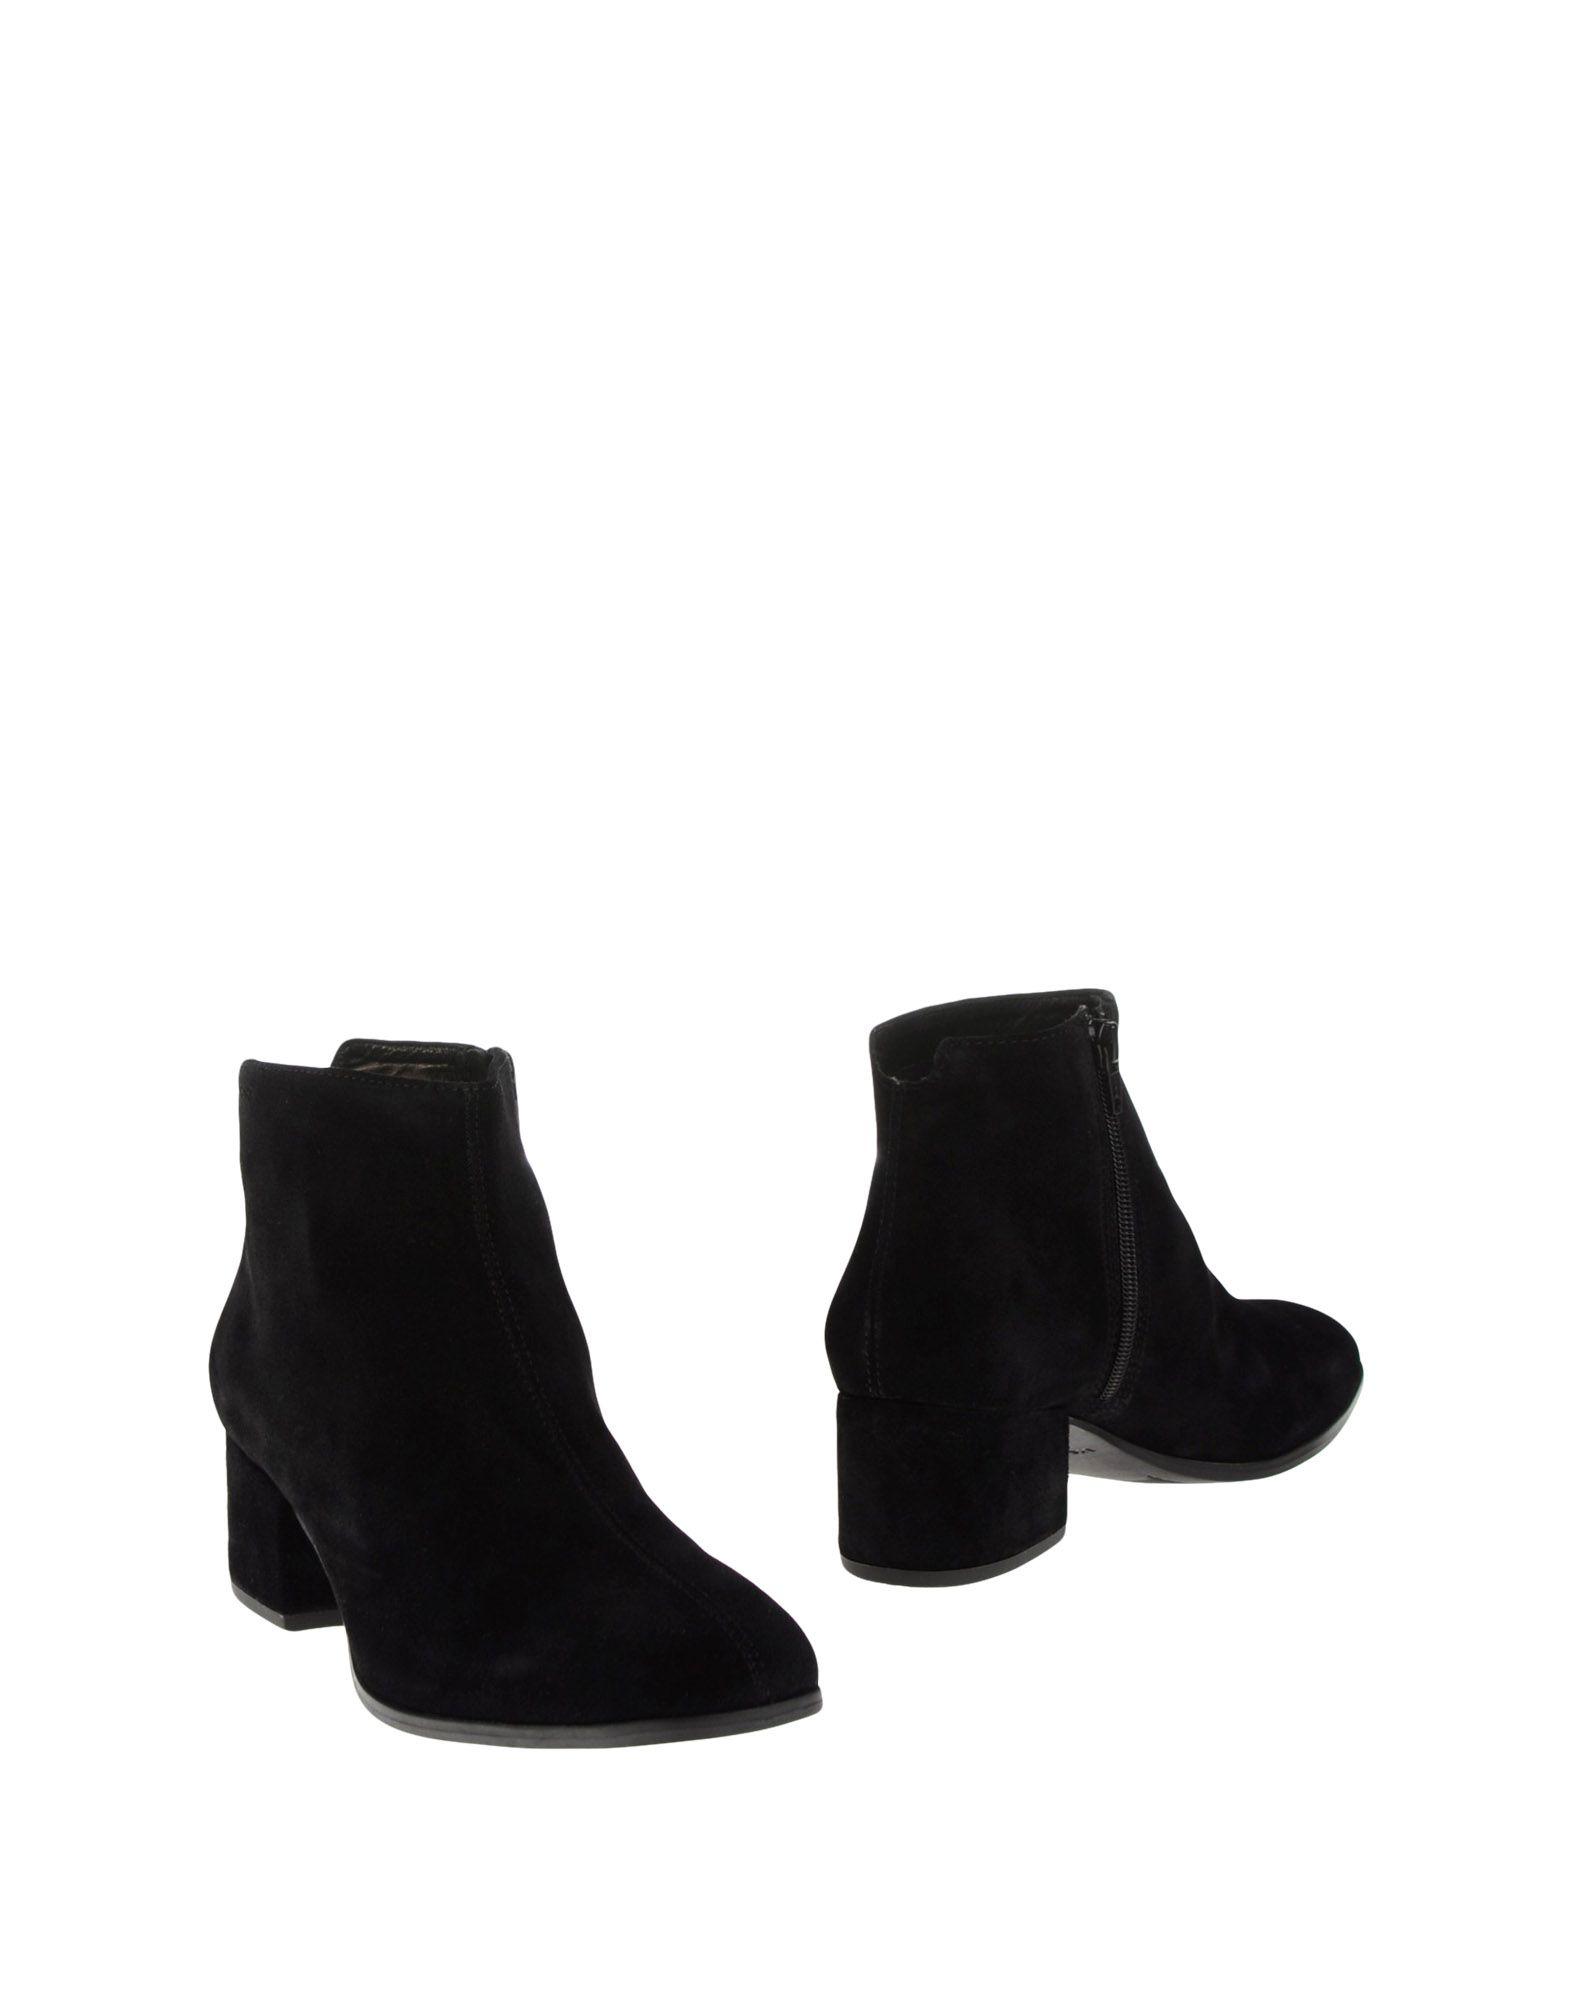 Vagabond Shoemakers Ankle Boot - Women Vagabond Shoemakers Ankle Boots - online on  Australia - Boots 11239439GT 68aabd